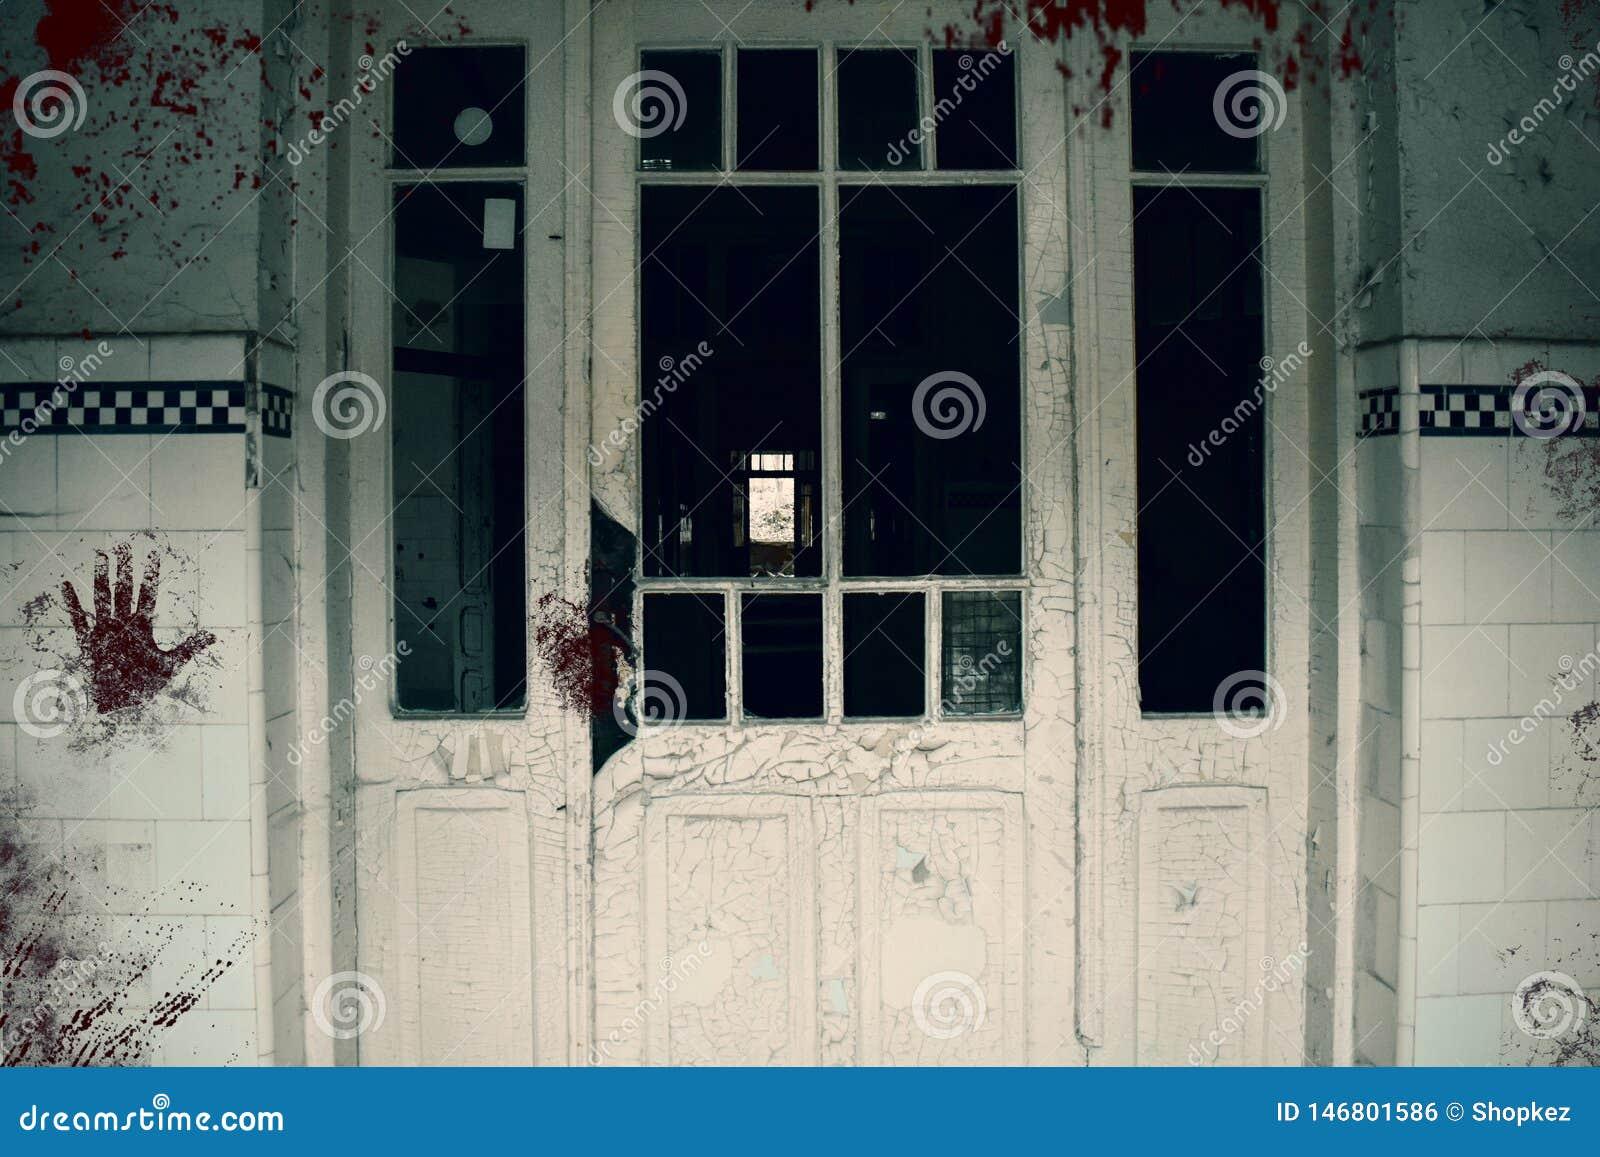 Creepy Bloody Door Of The Haunted Asylum Abandoned And